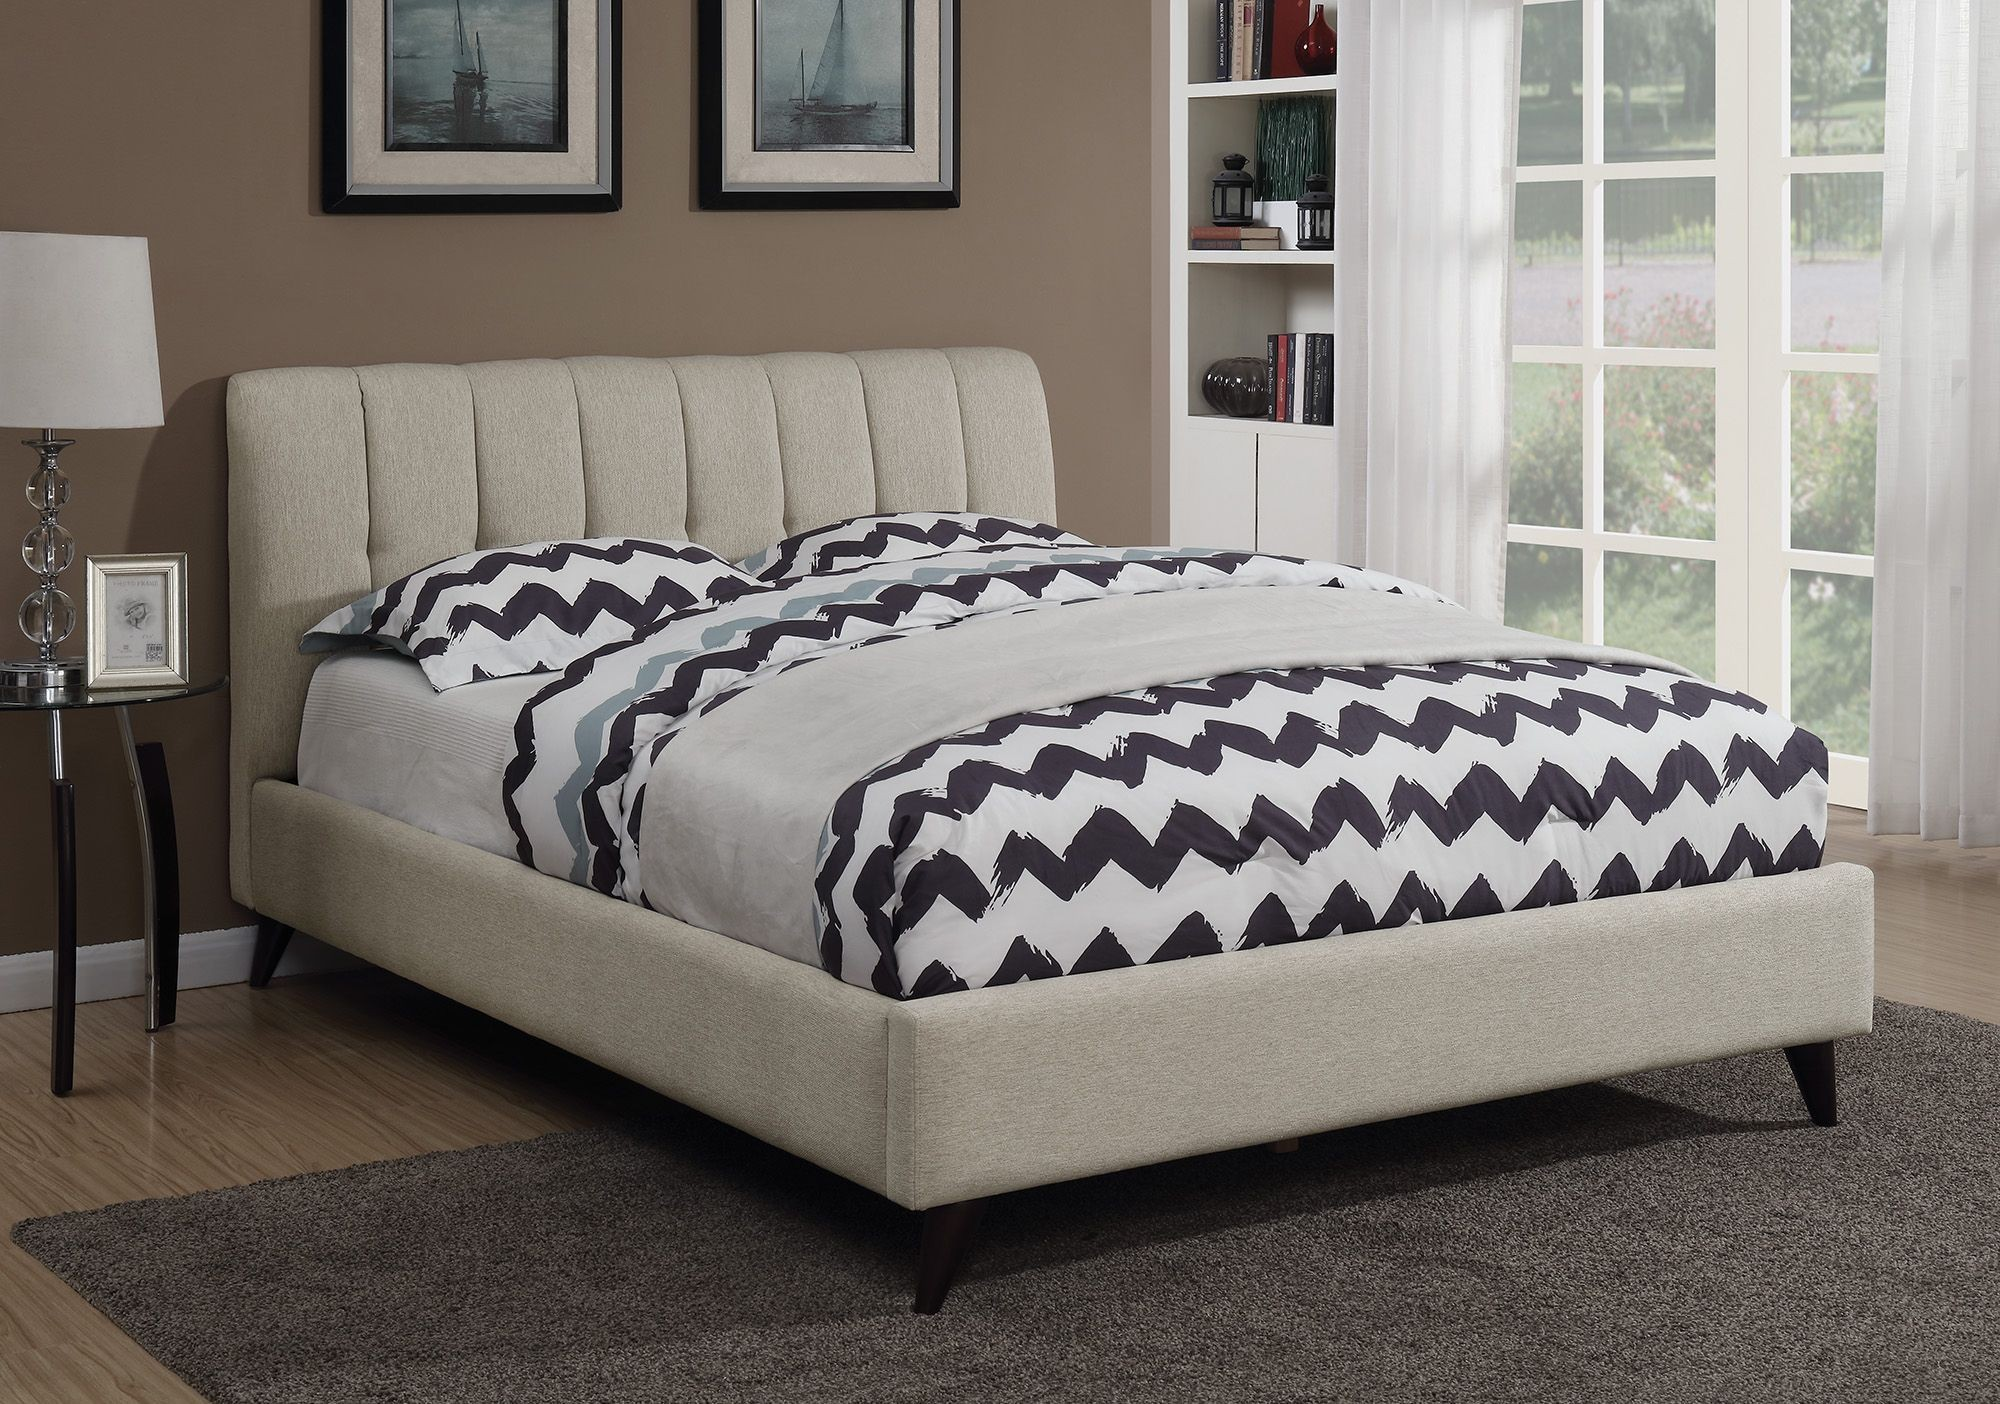 b20a5c5231c92 Portola Oatmeal King Upholstered Platform Bed from Coaster